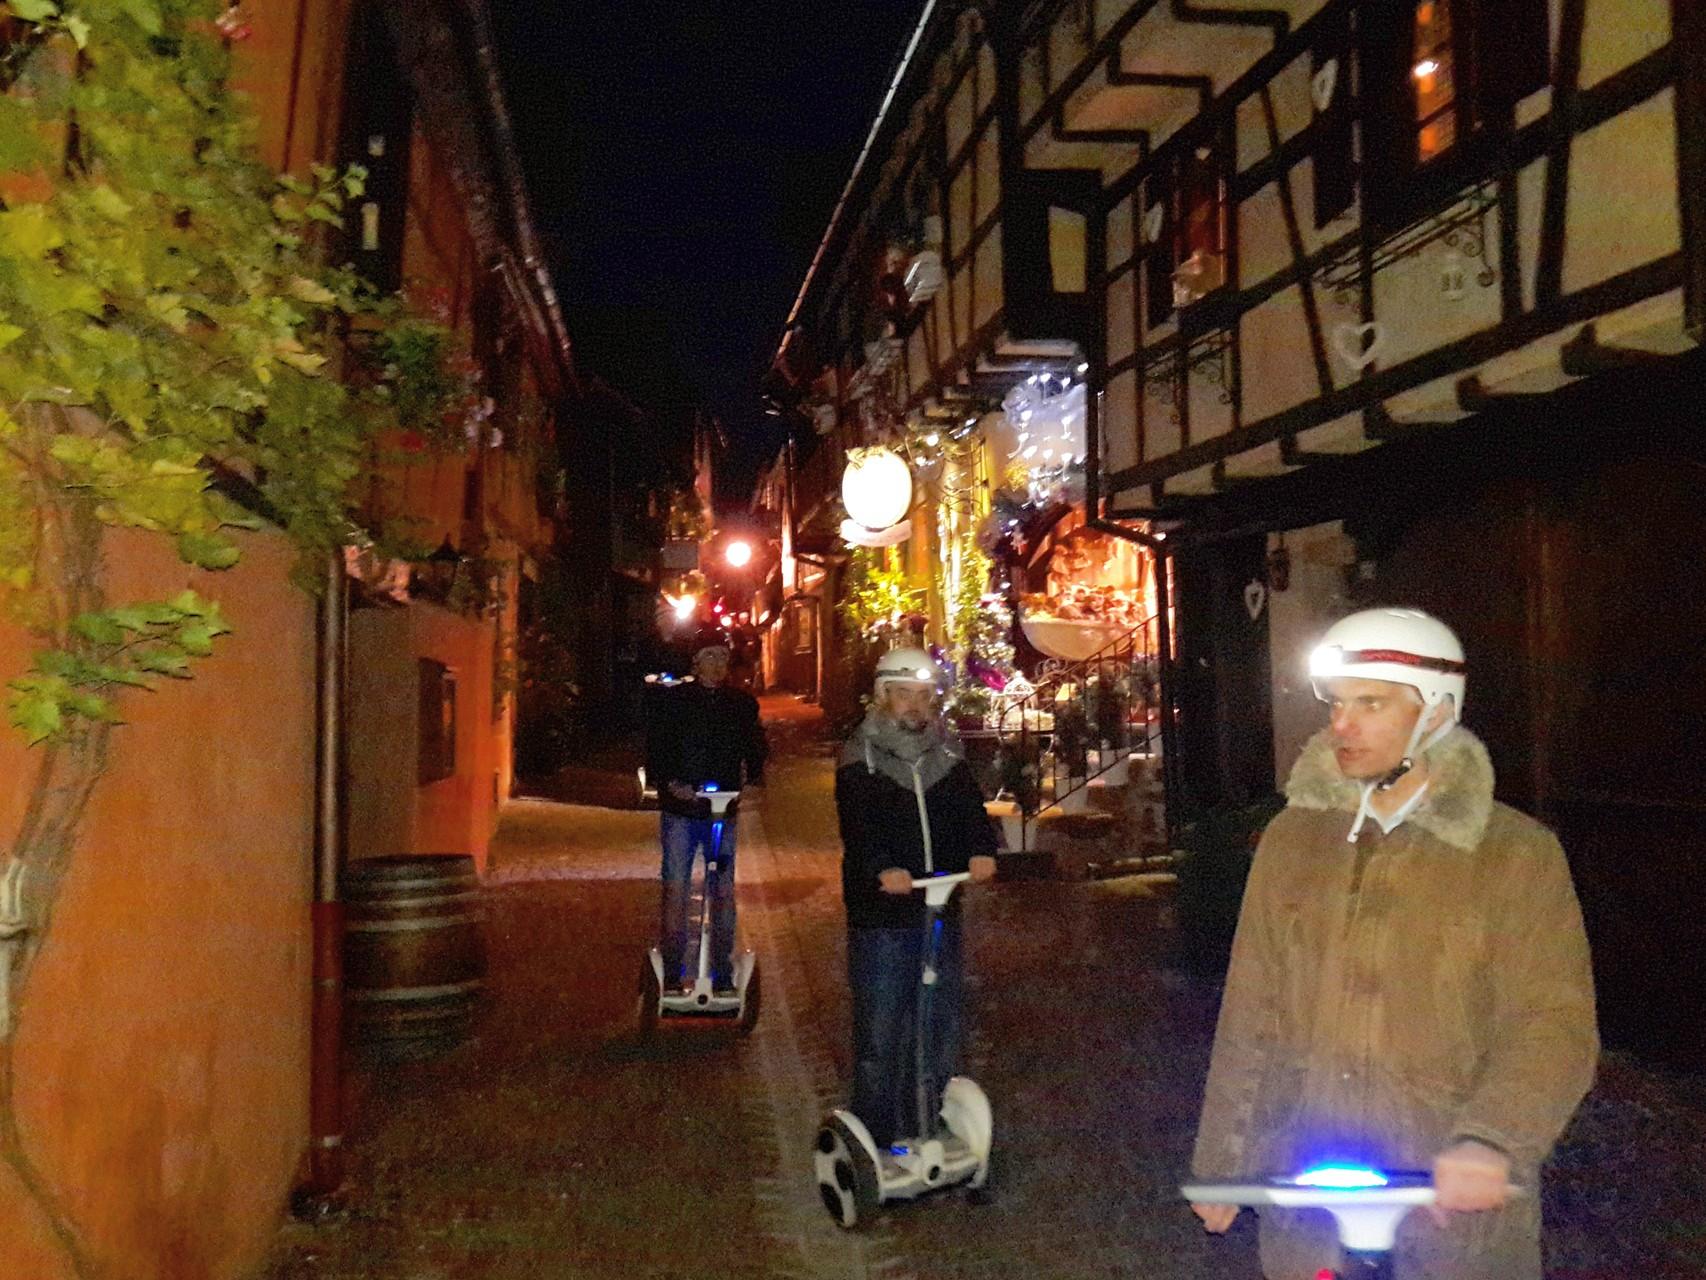 FUN MOVING GYROPODE SEGWAY EN ALSACE - Riquewihr, team building, incentive, séminaire